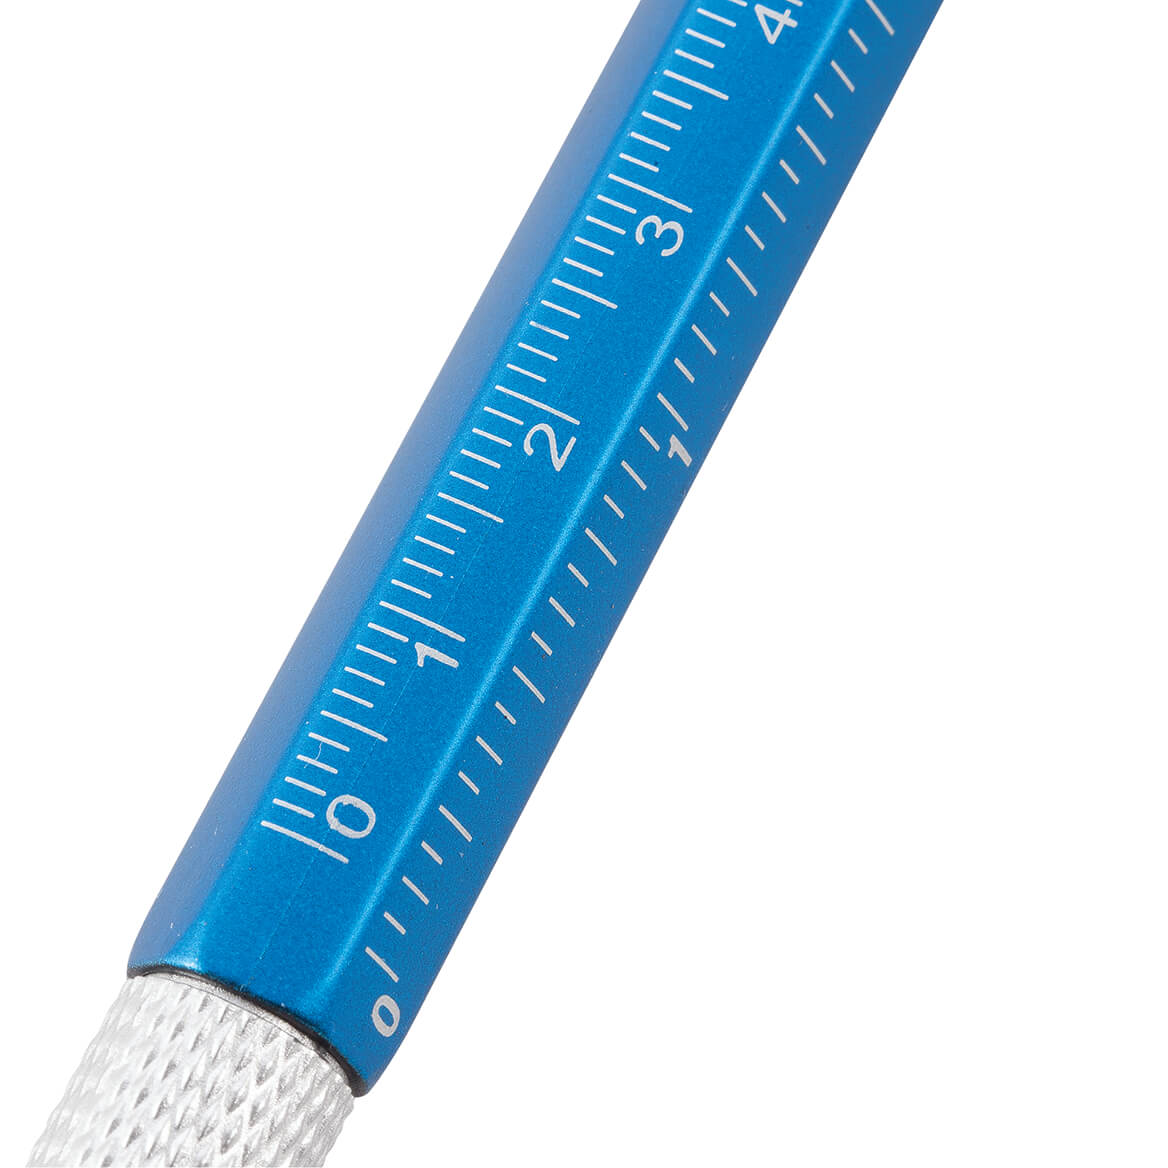 6-in-1 Multifunctional Pen Set of 6-367538